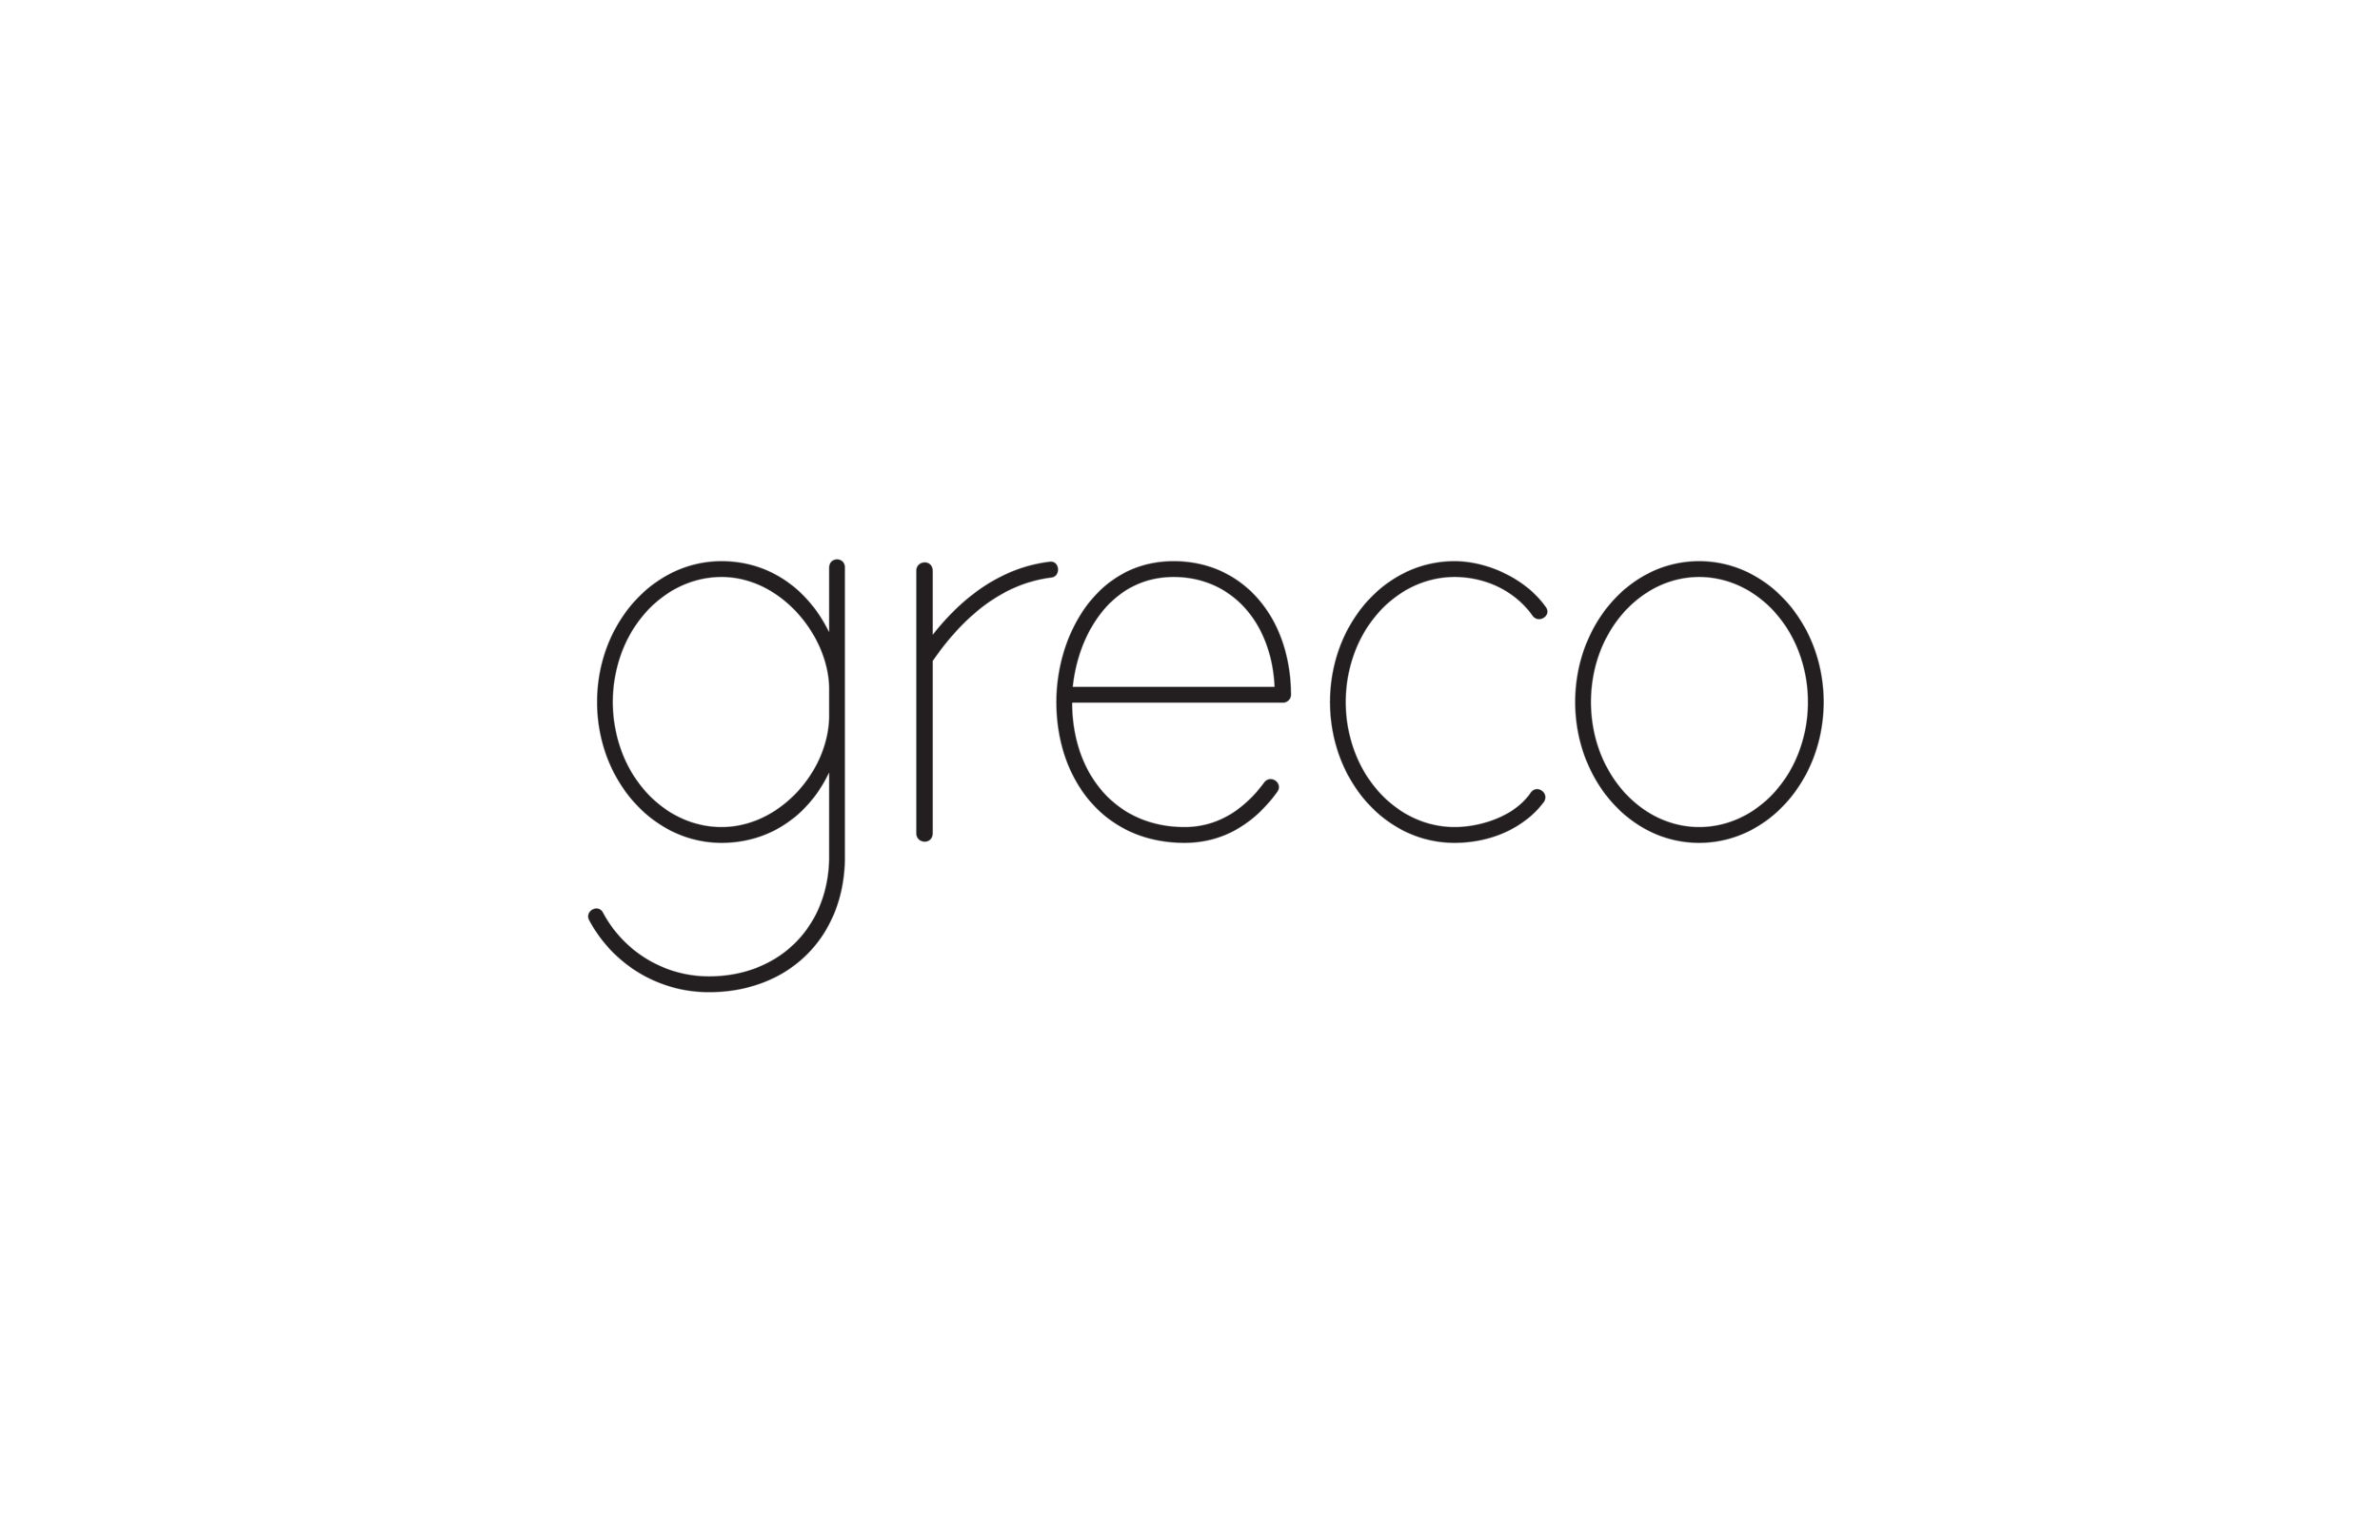 Greco Logo-02-01.png